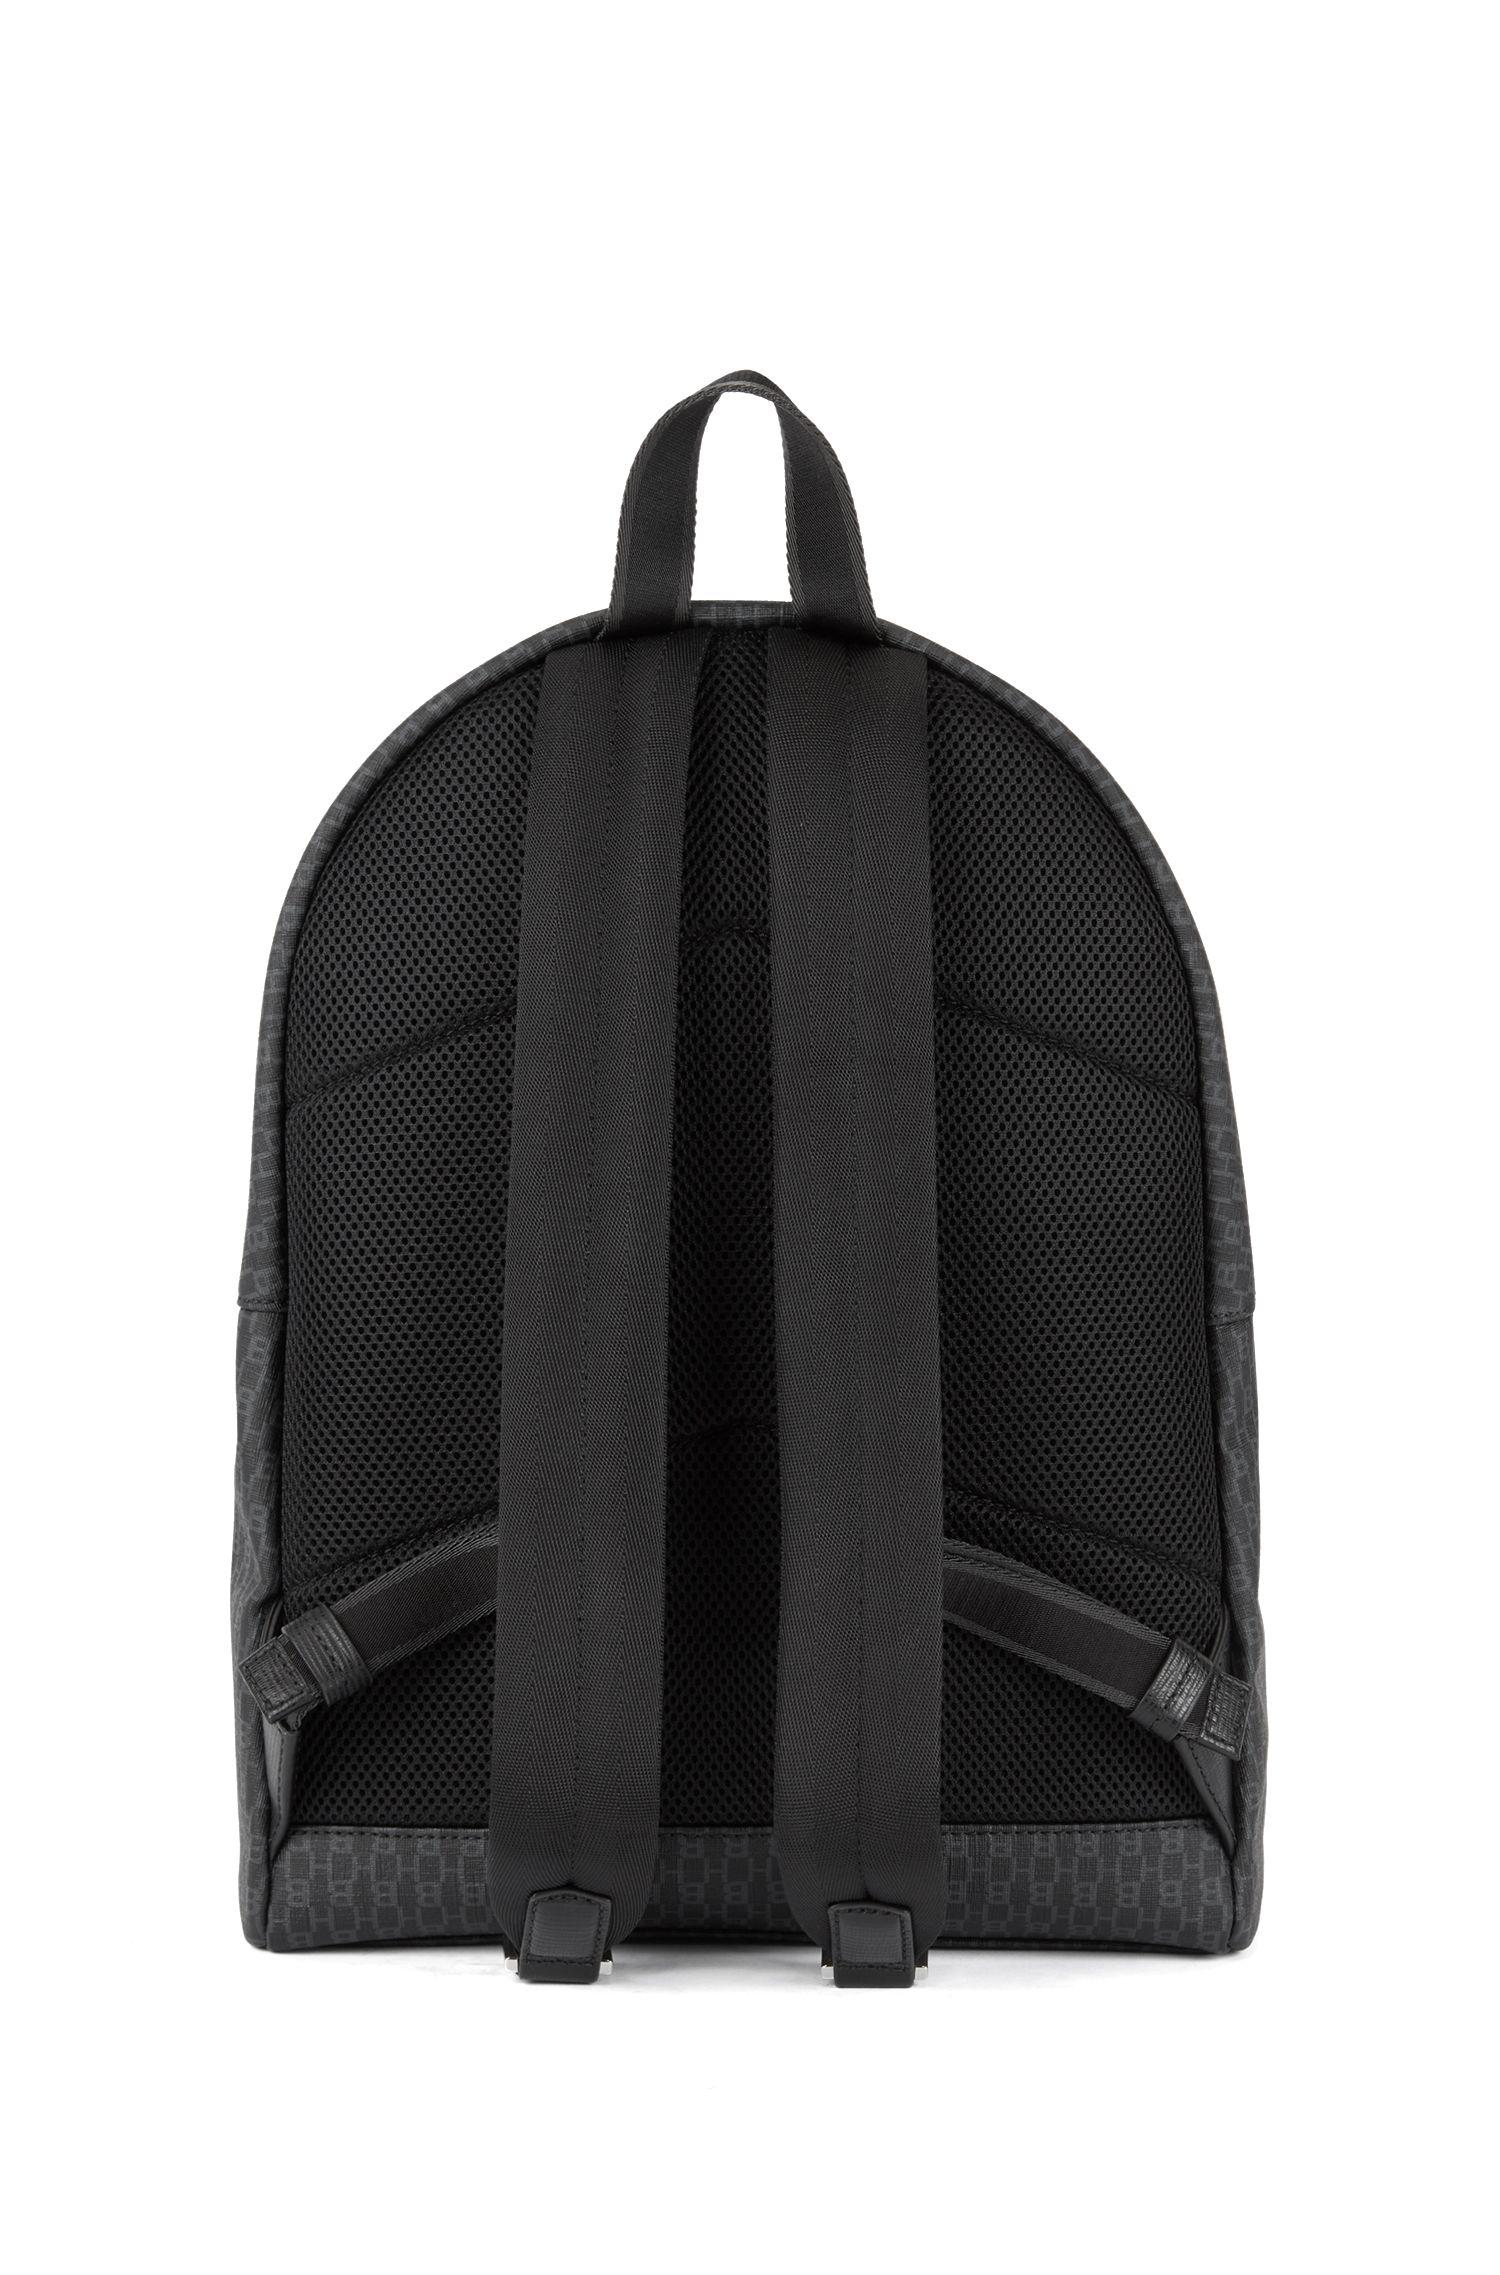 Monogram-print backpack in coated Italian fabric, Black